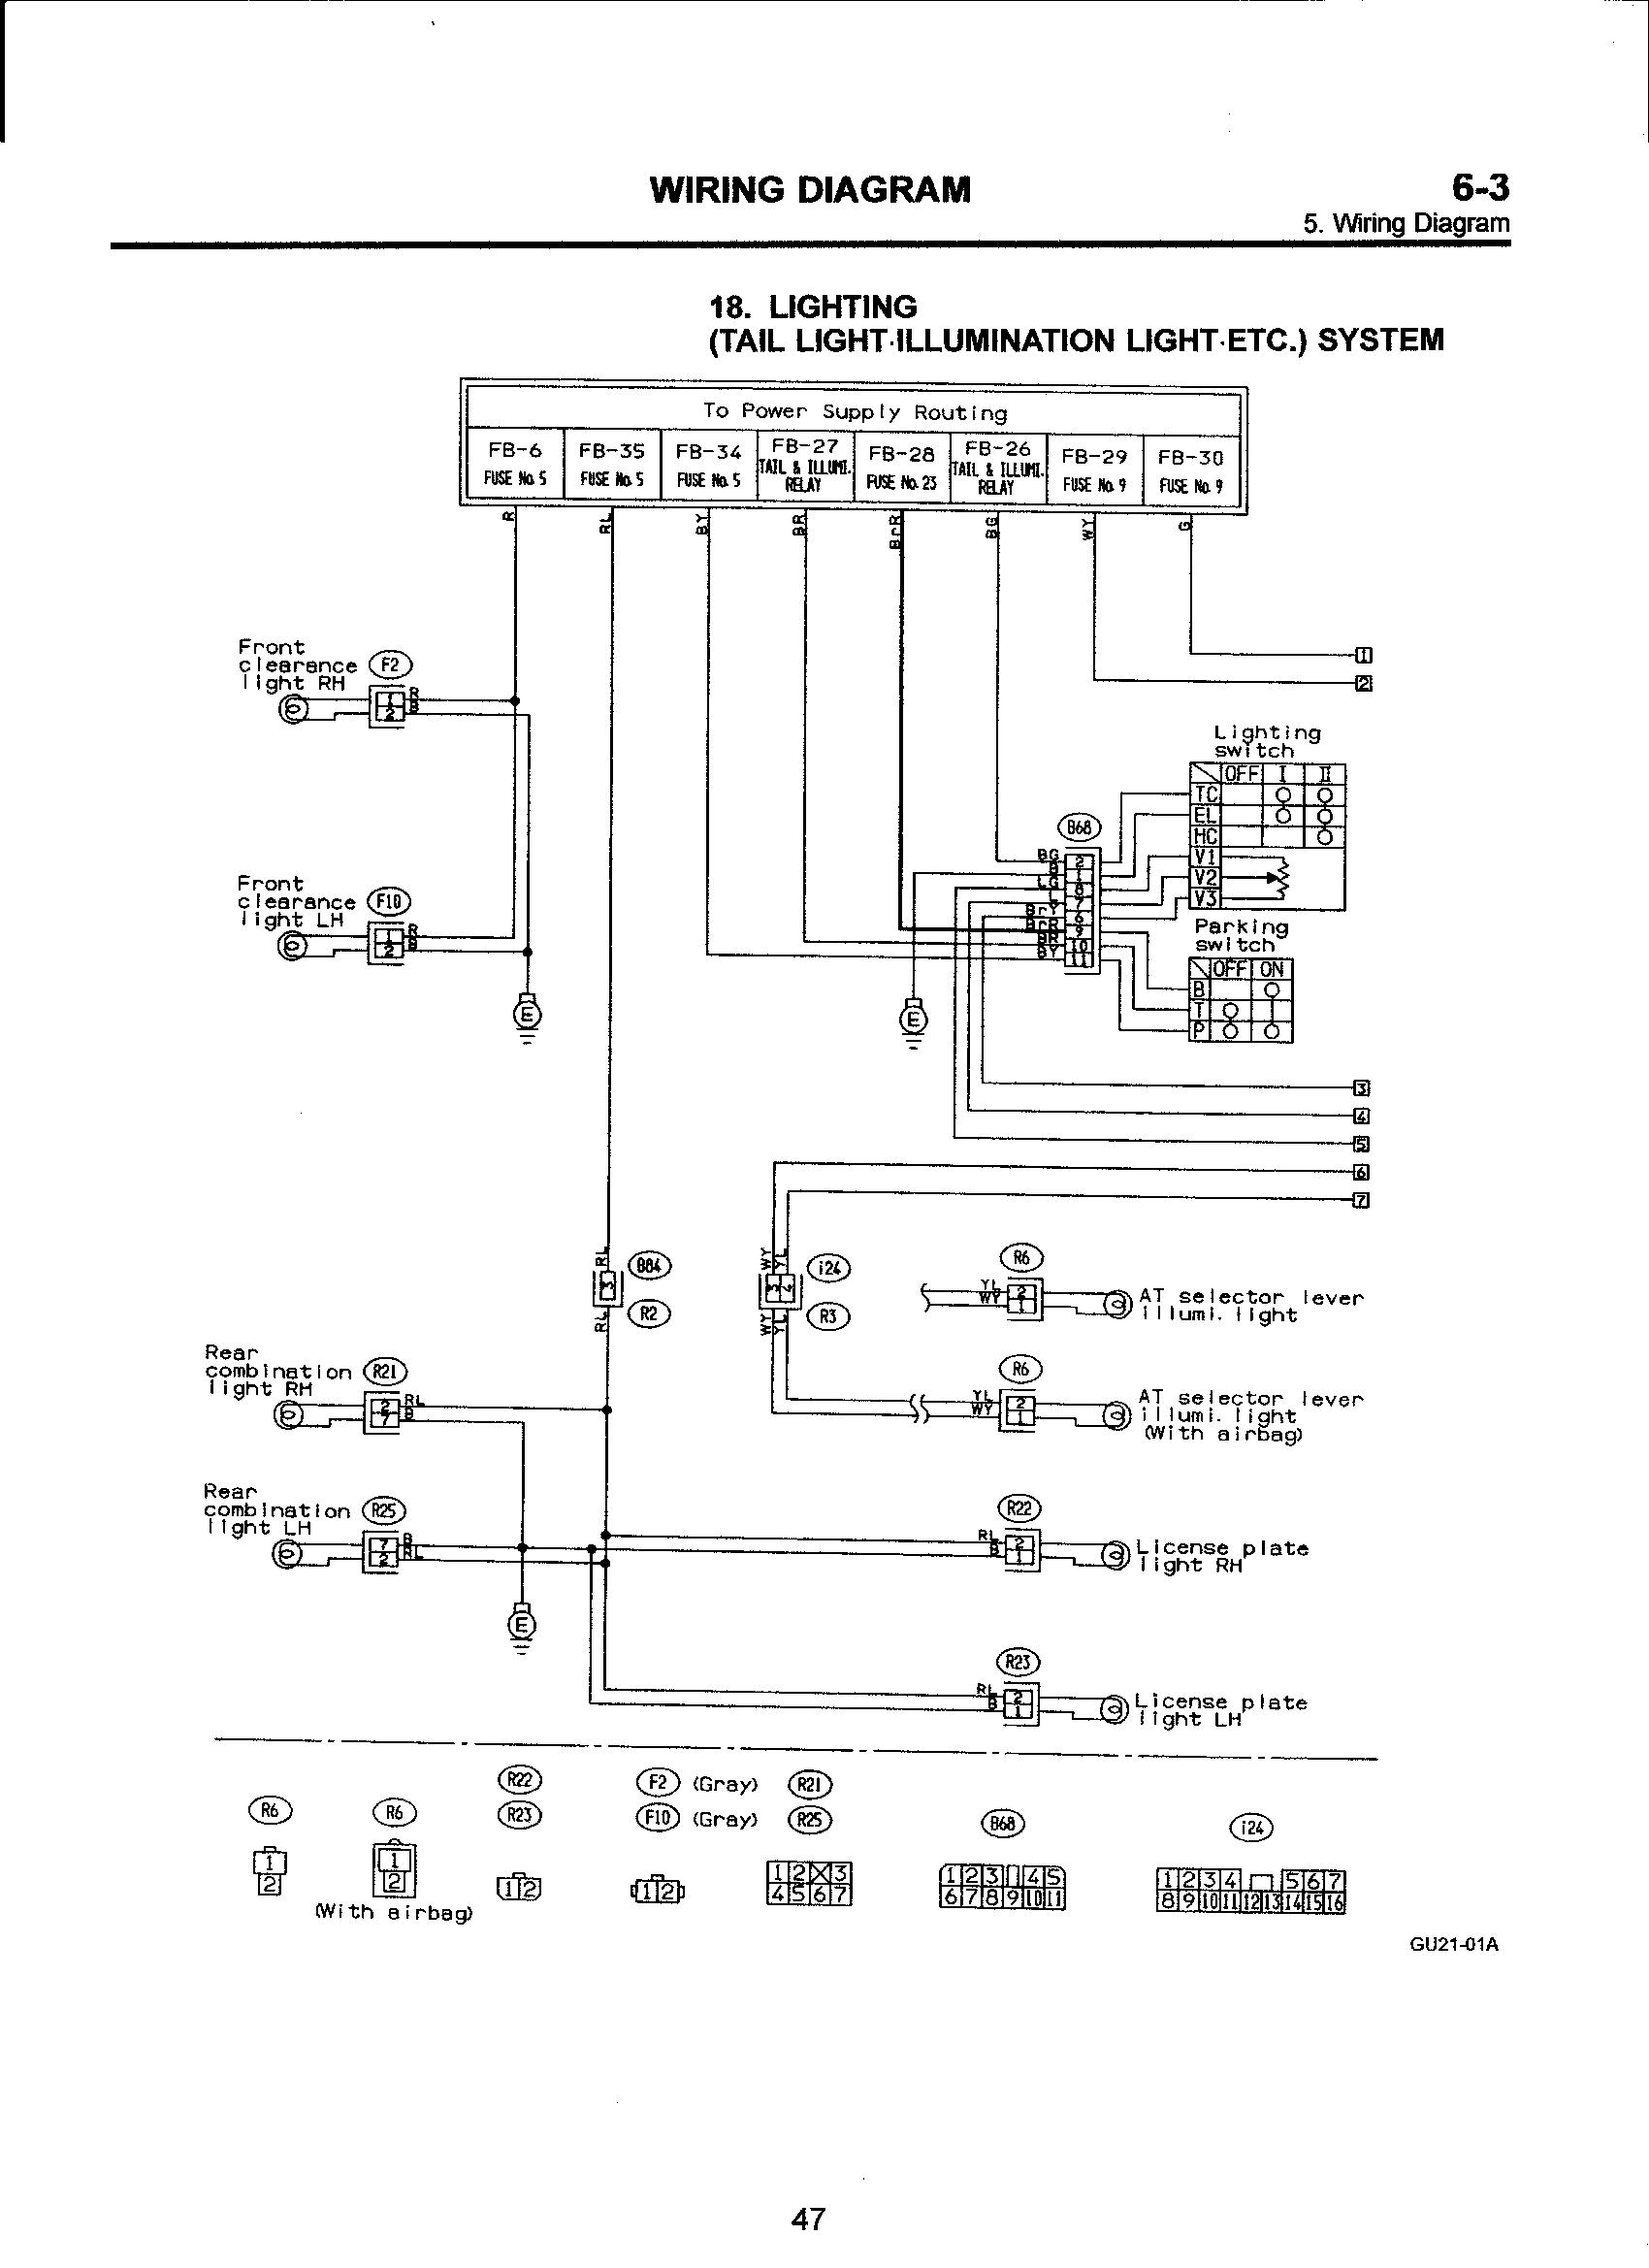 I Need An Electrical Diagram For A 1993 Subaru Impreza